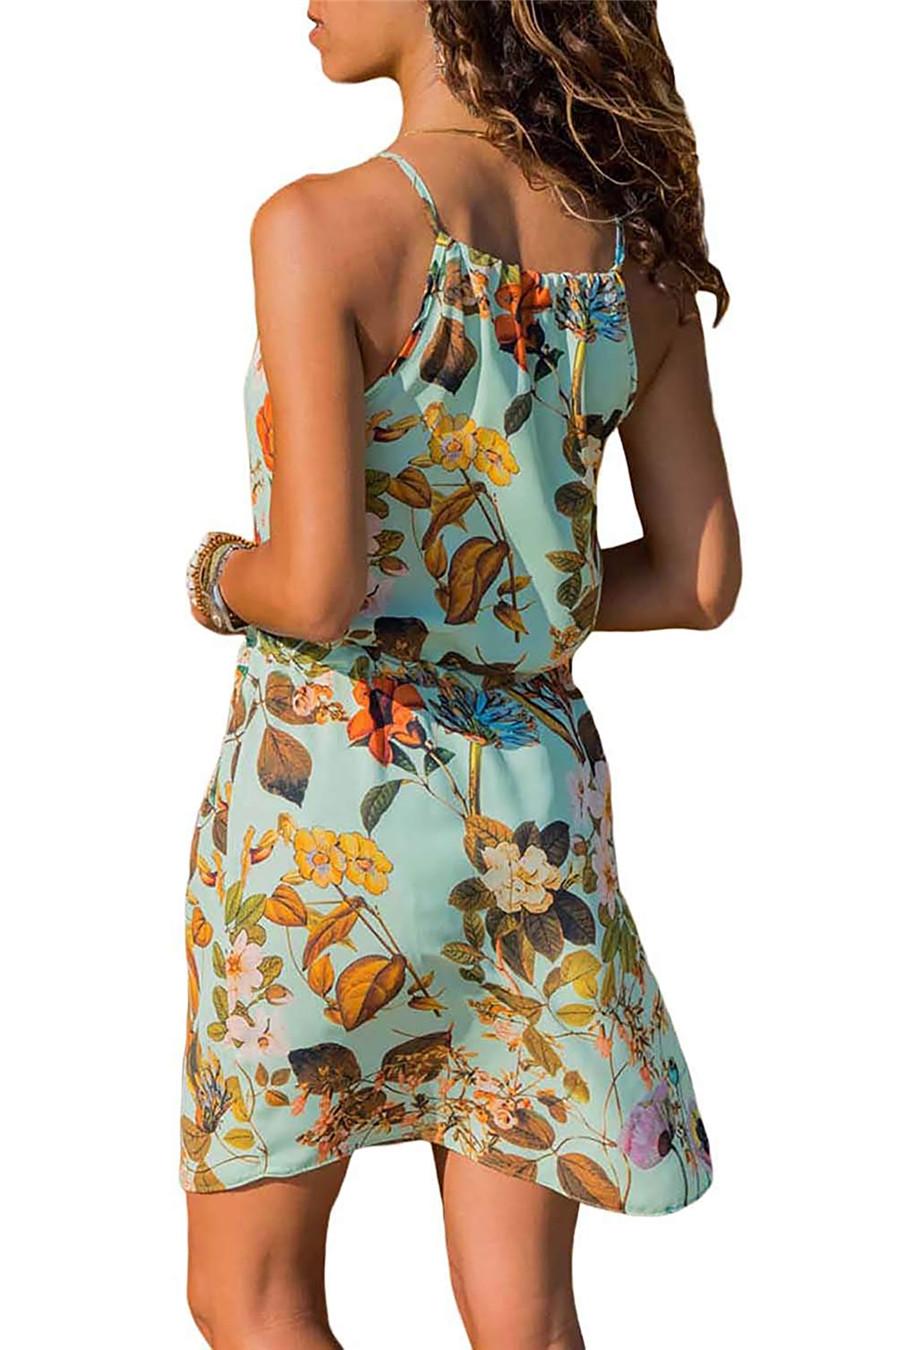 Gladiolus Chiffon Women Summer Dress Spaghetti Strap Floral Print Pocket Sexy Bohemian Beach Dress 2019 Short Ladies Dresses (40)